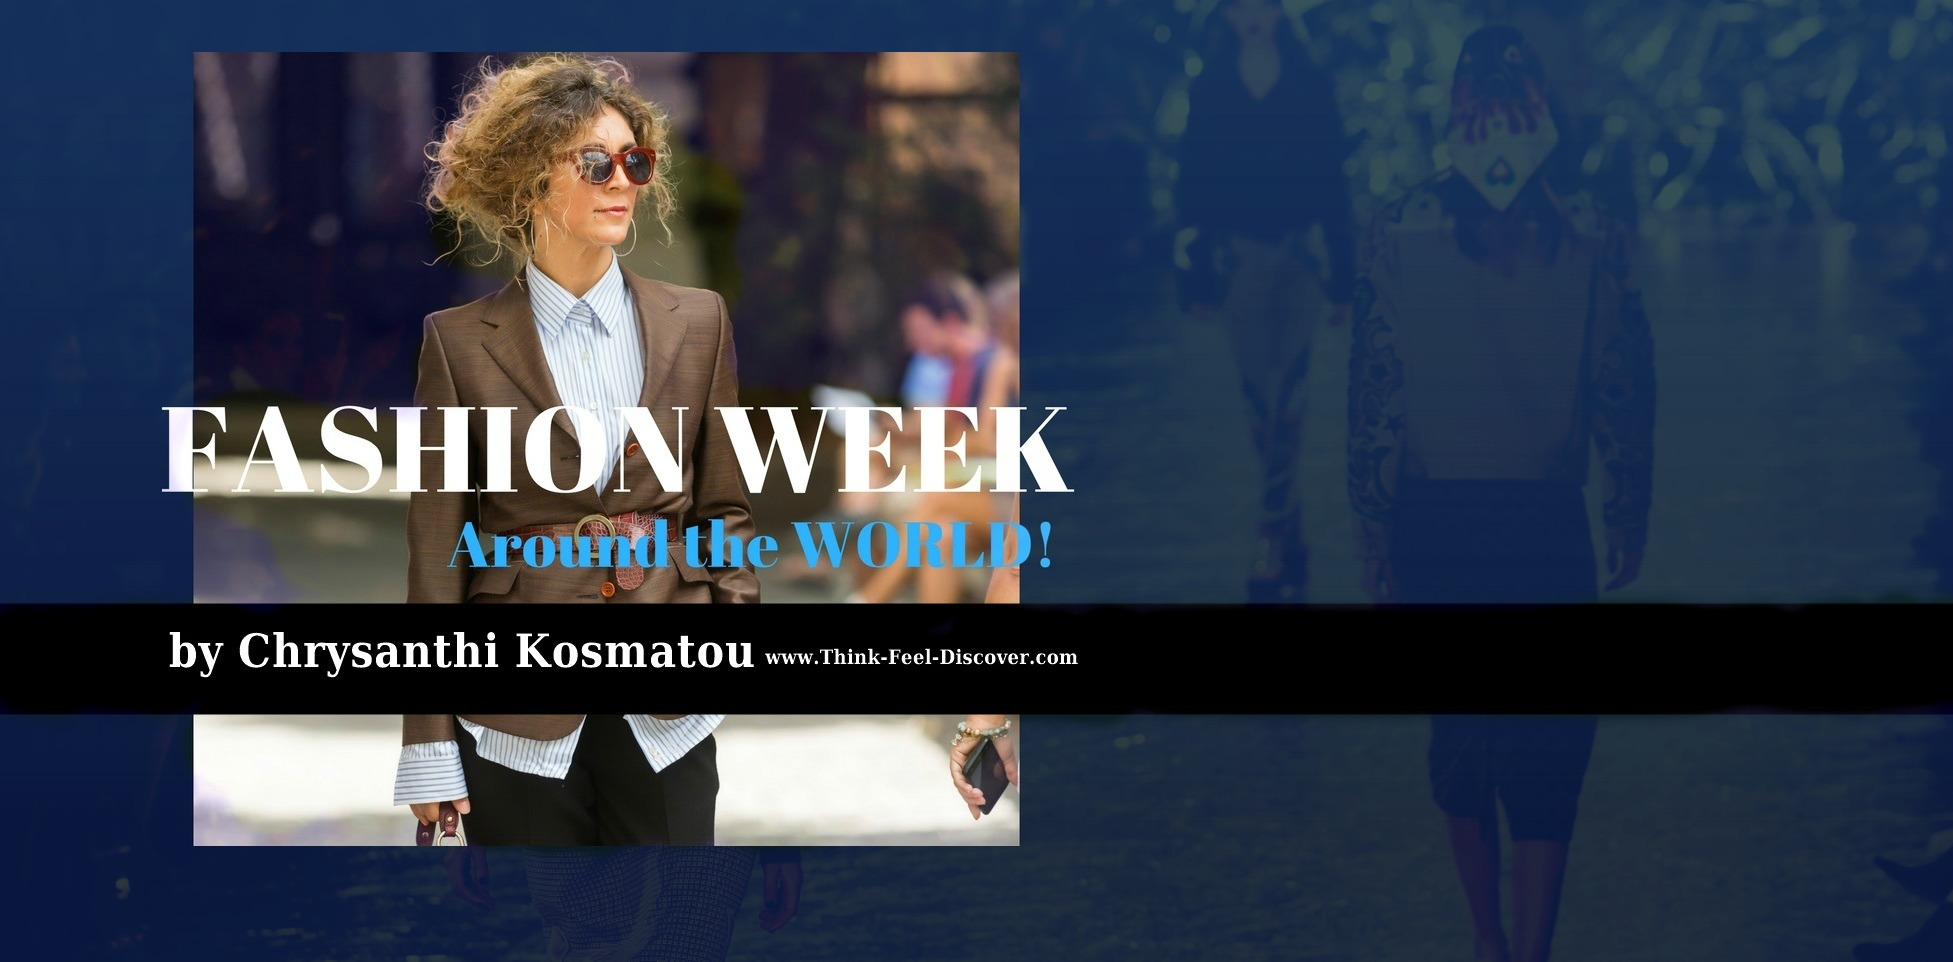 Fashion Week. Catwalk Highlights by Chrysanthi Kosmatou. Photographer credits: www.Think-Feel-Discover.com